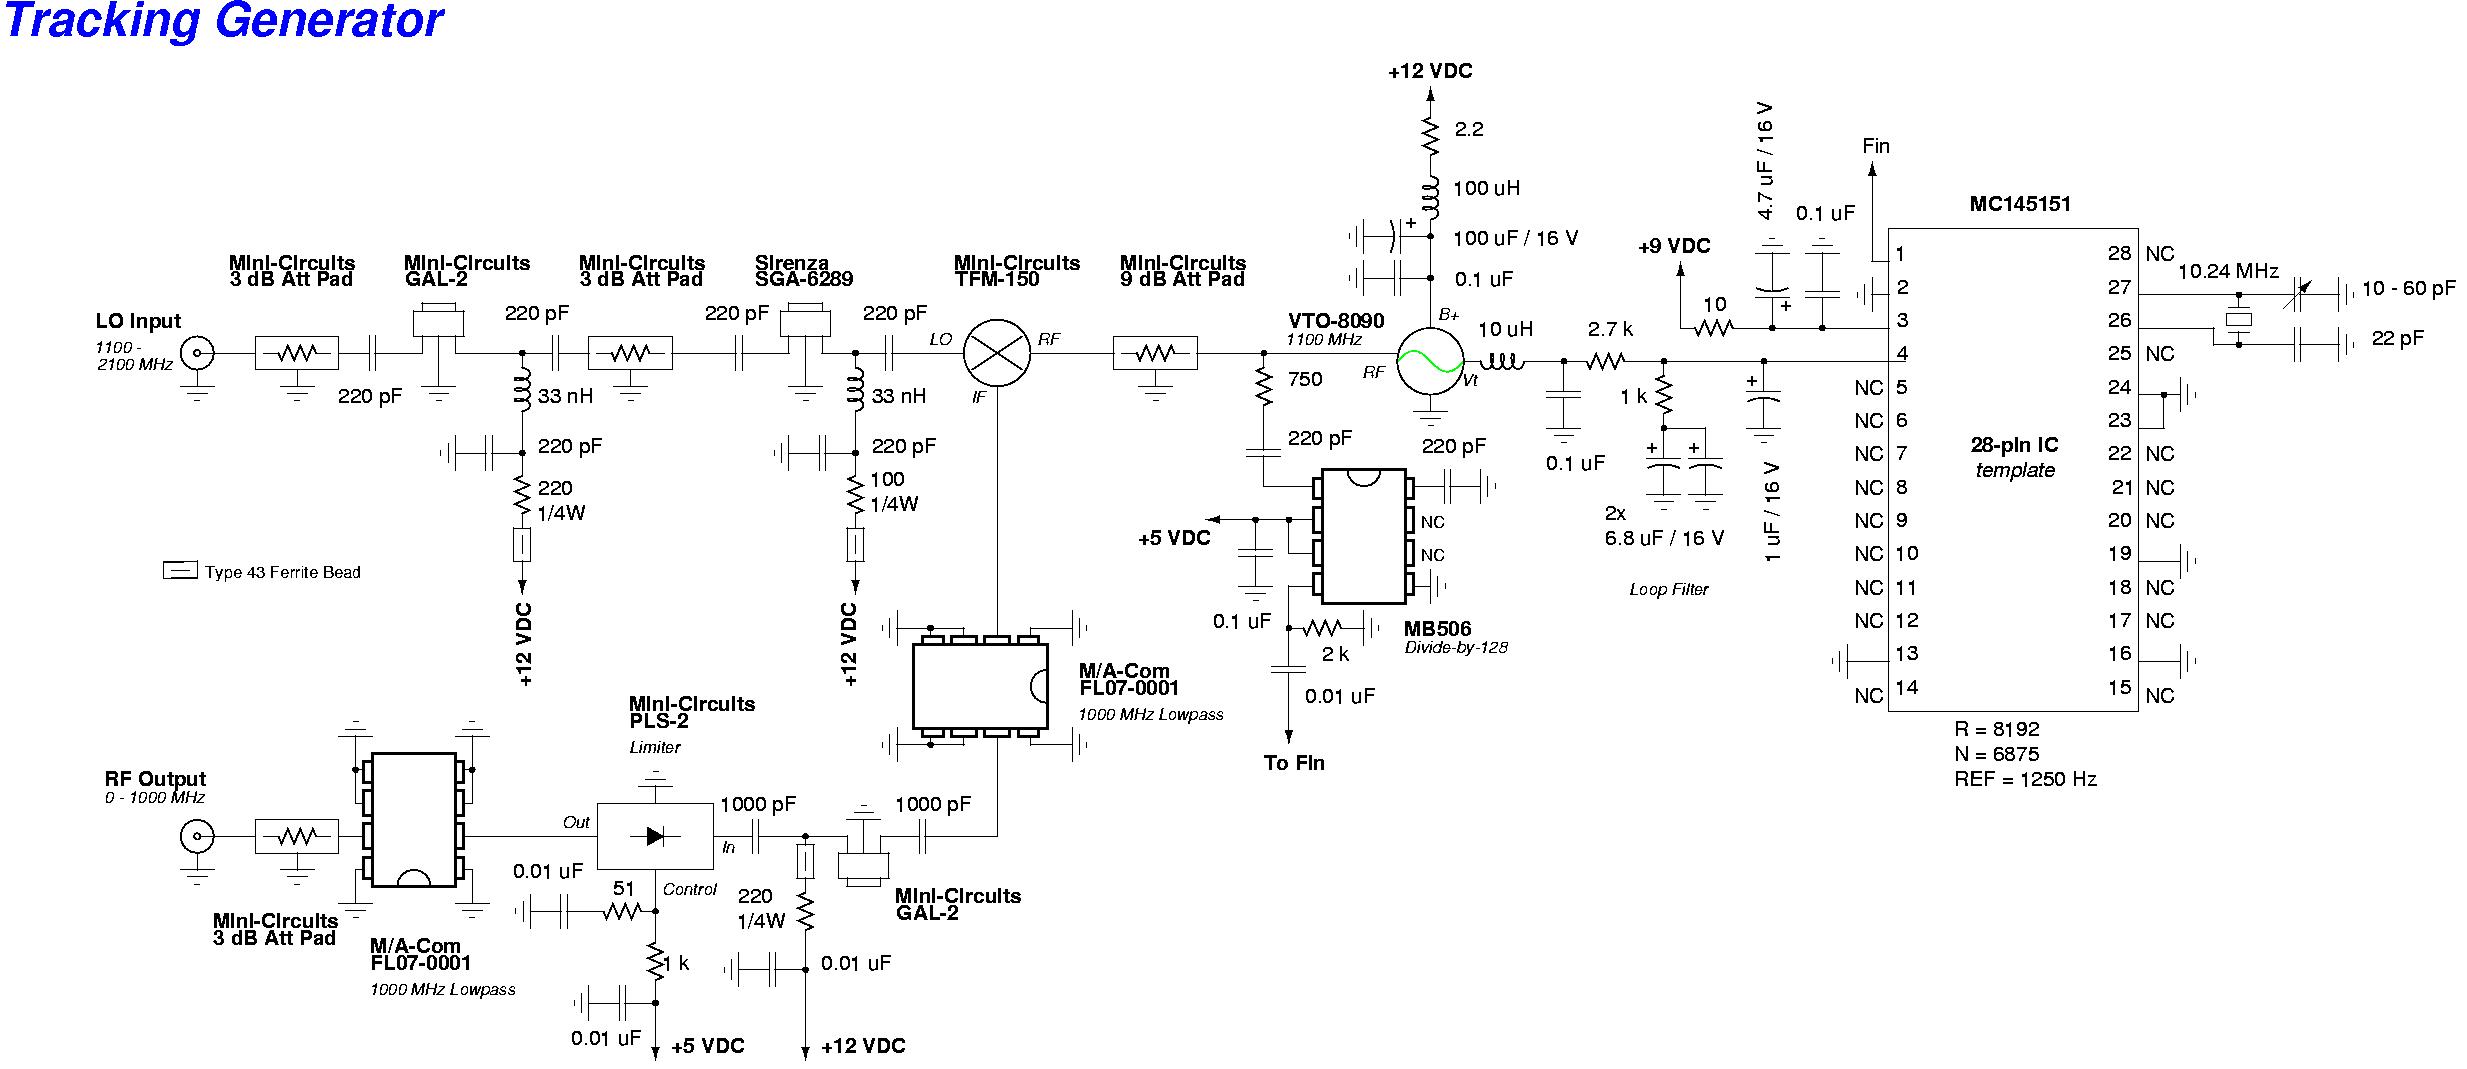 audio spectrum analyzer circuit diagram electric motor wiring single phase gbppr 1000 mhz